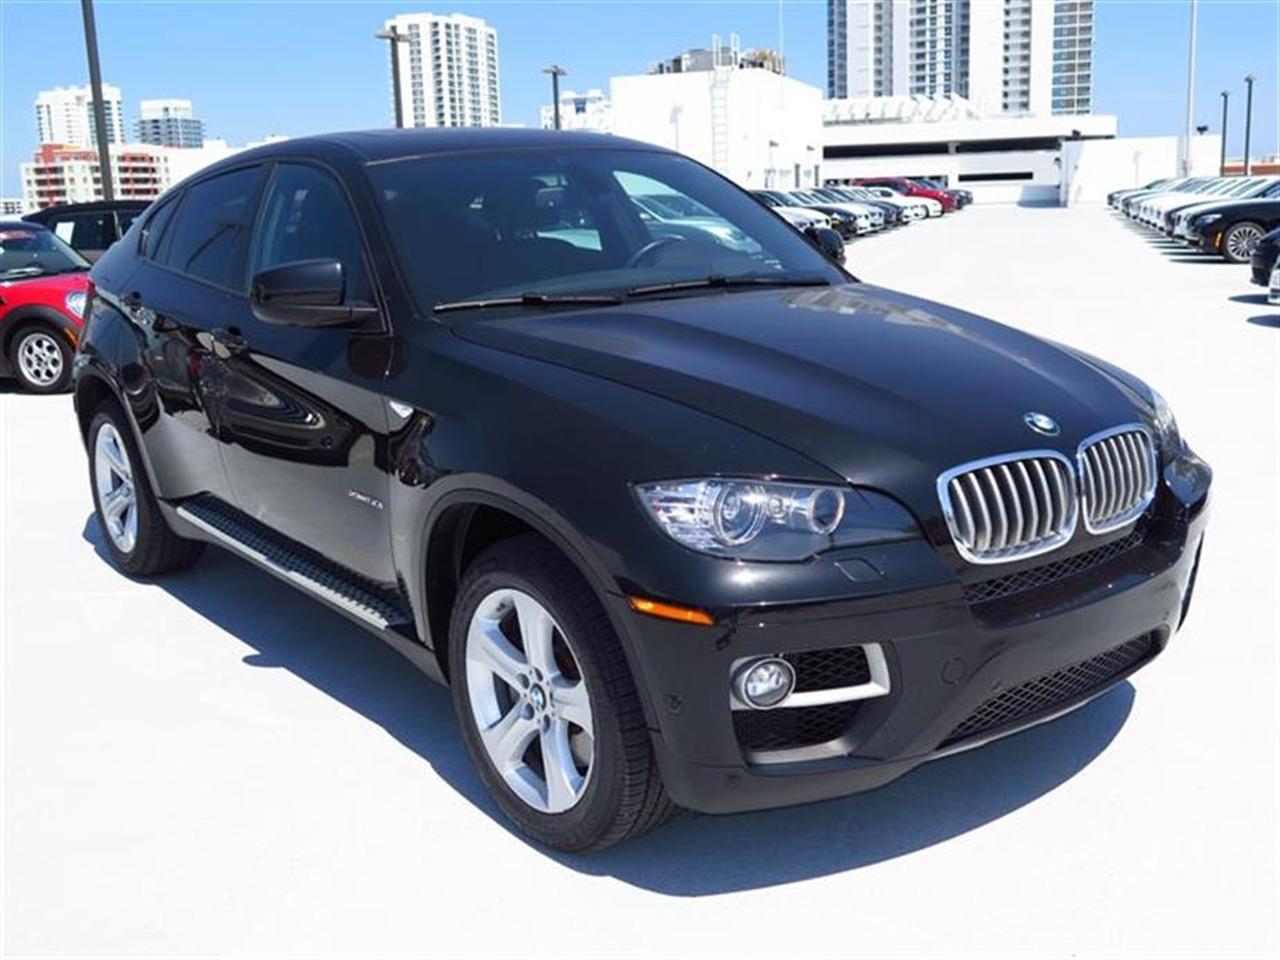 2013 BMW X6 AWD 4dr xDrive50i 28142 miles 20-way power multi-contour front bucket seats -inc sta